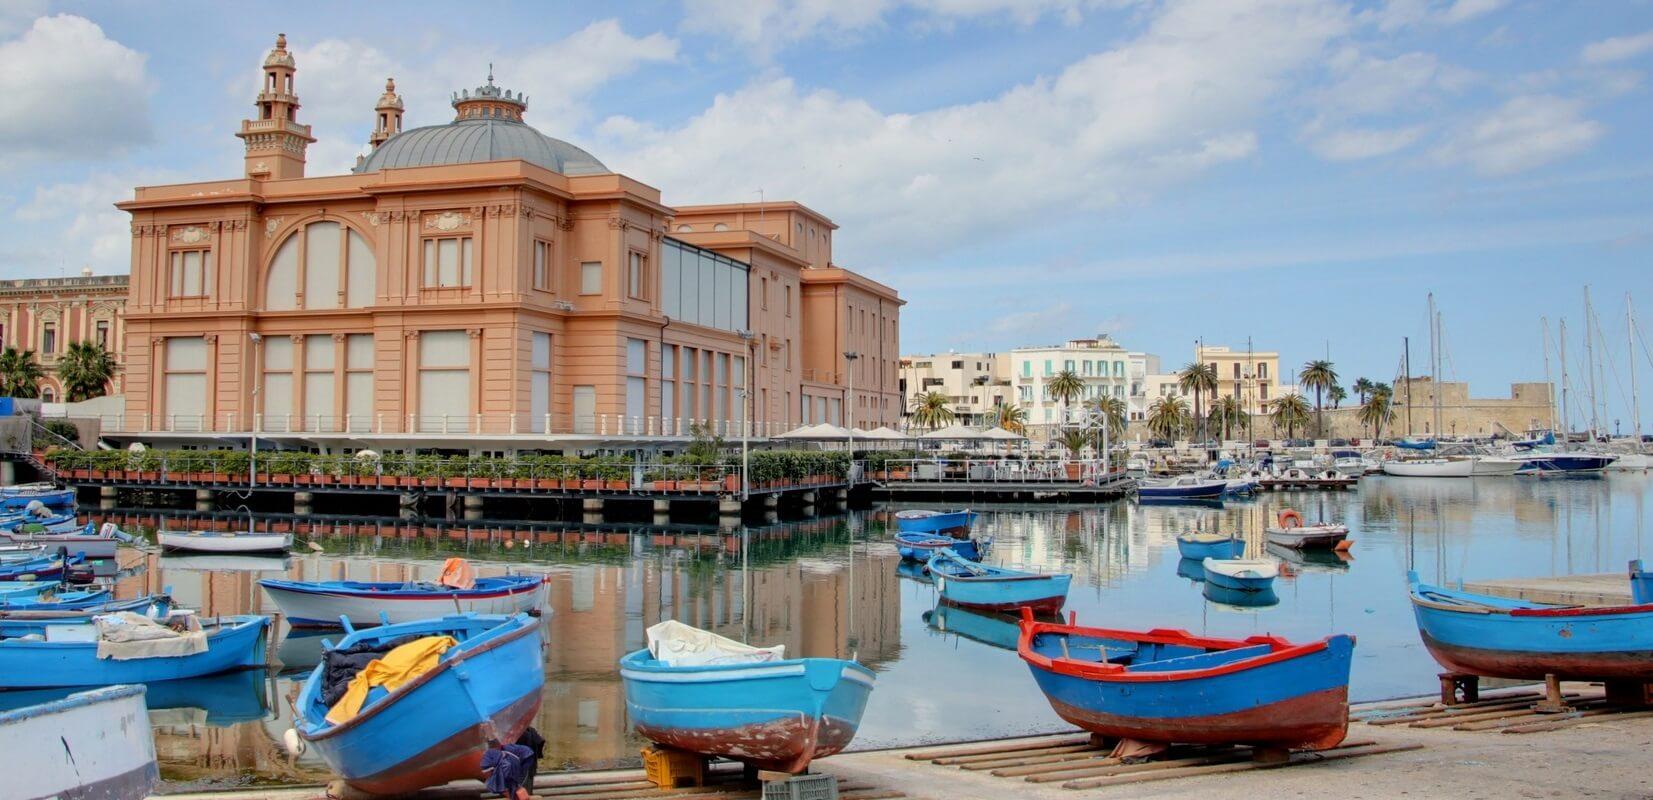 Cheap flights from Bari